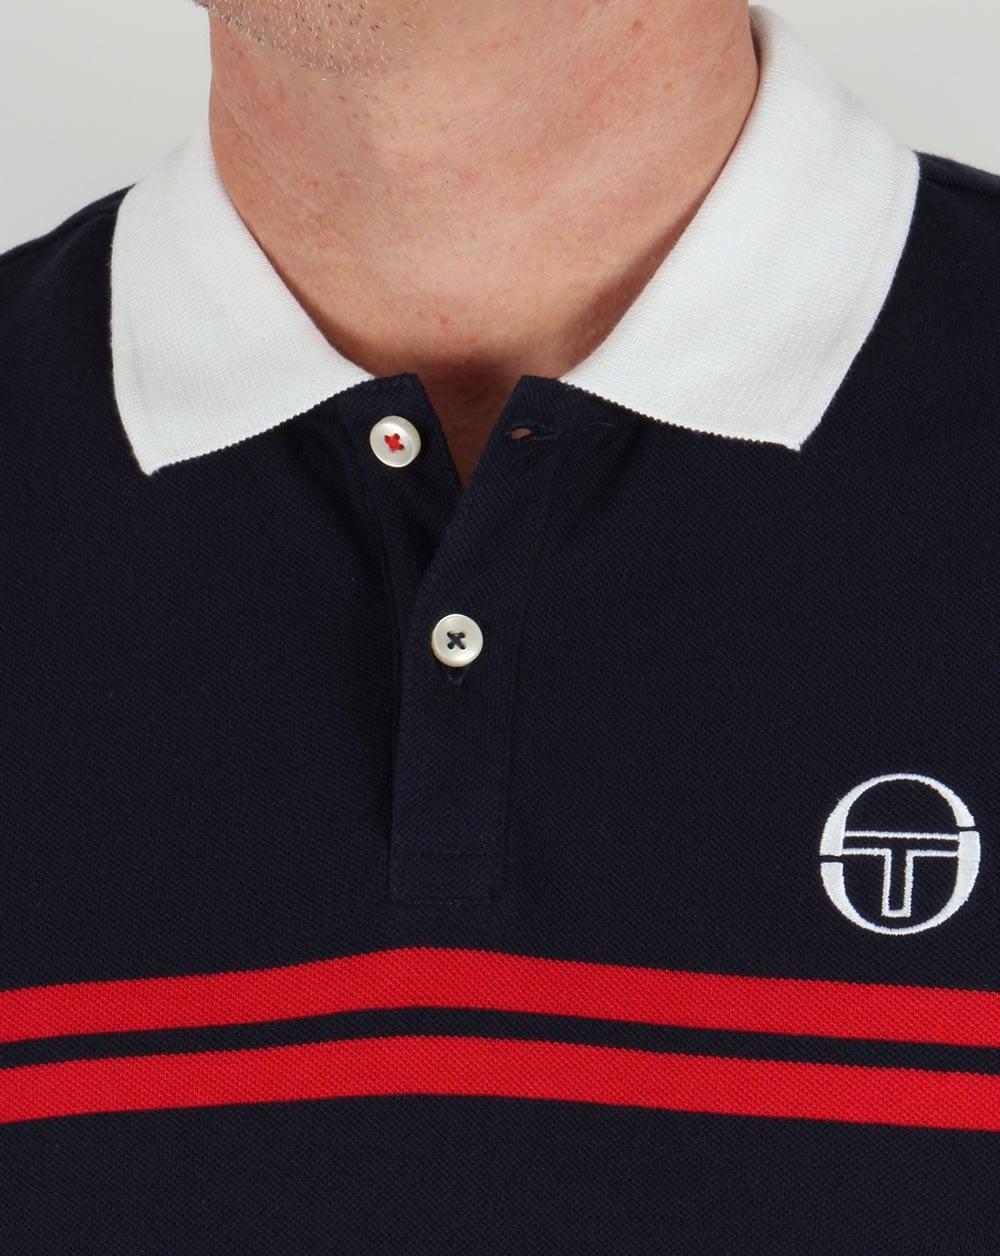 a7c1865d Sergio Tacchini Super Mac Polo Shirt Navy/White/Red,mens,mcenroe,sport